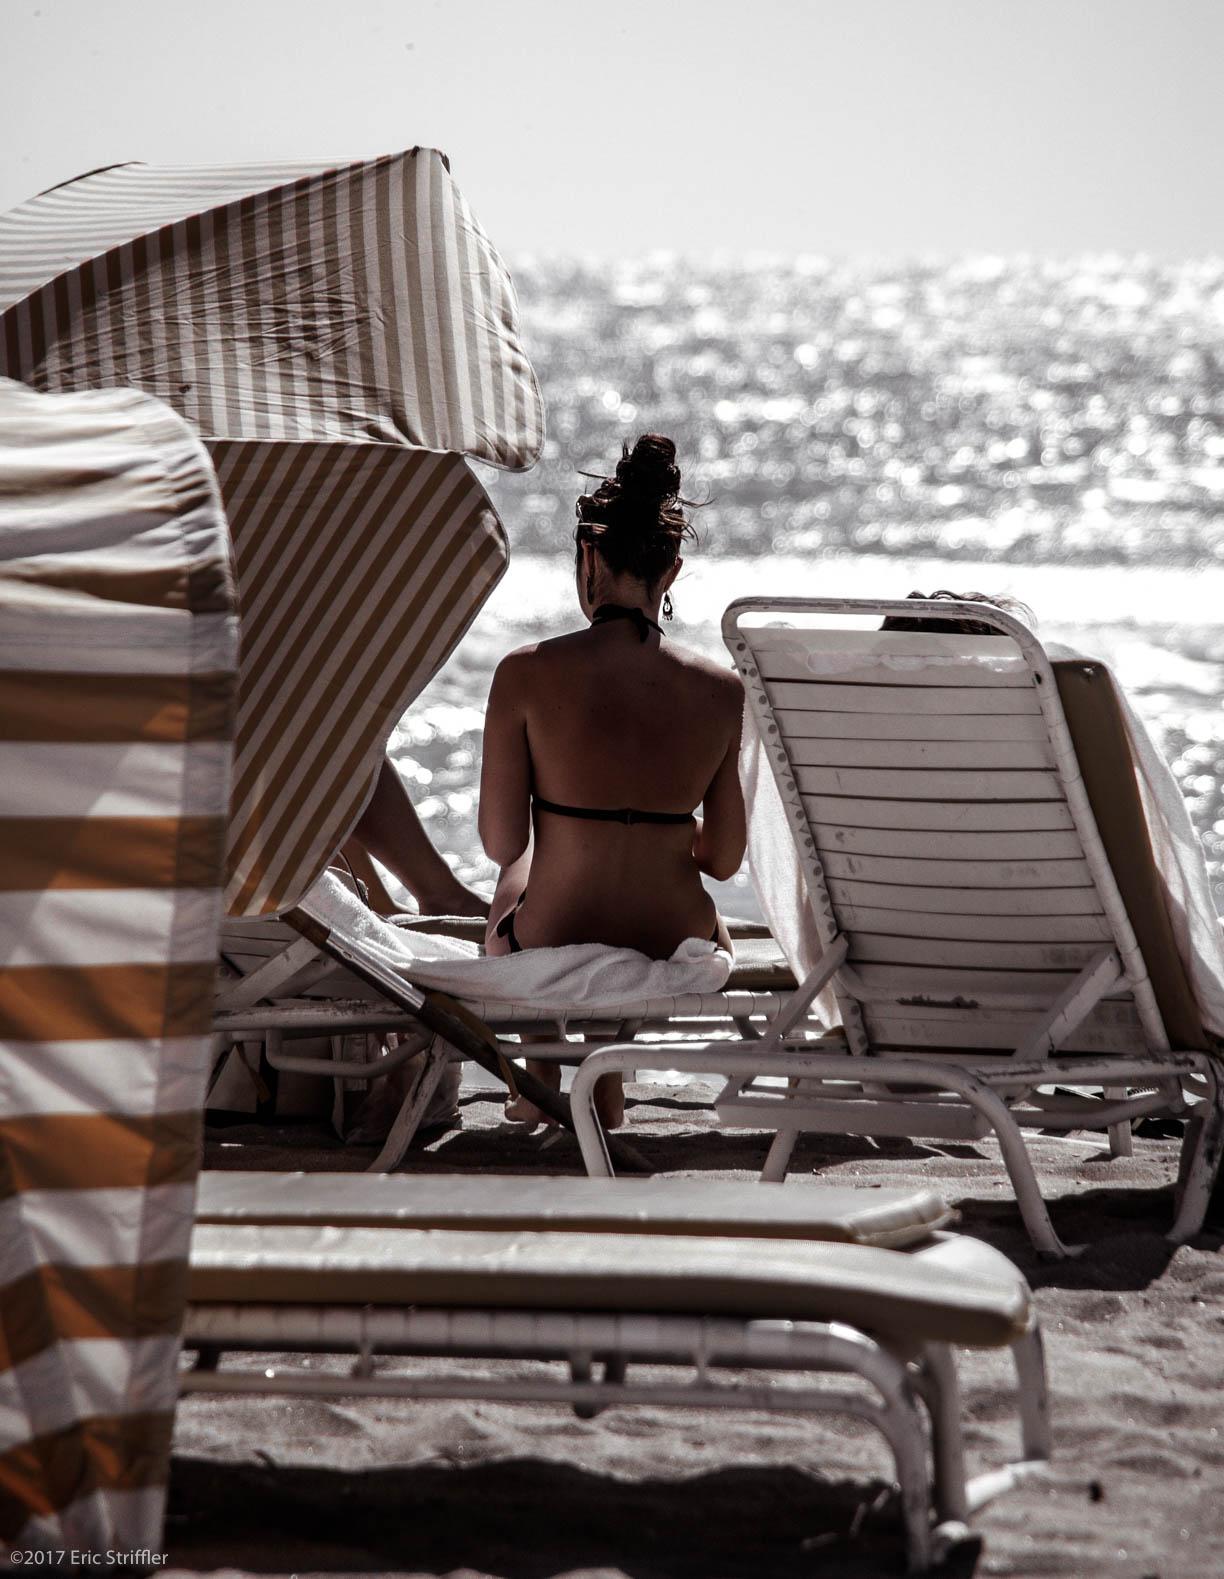 eric_striffler_photography_travel-151.jpg